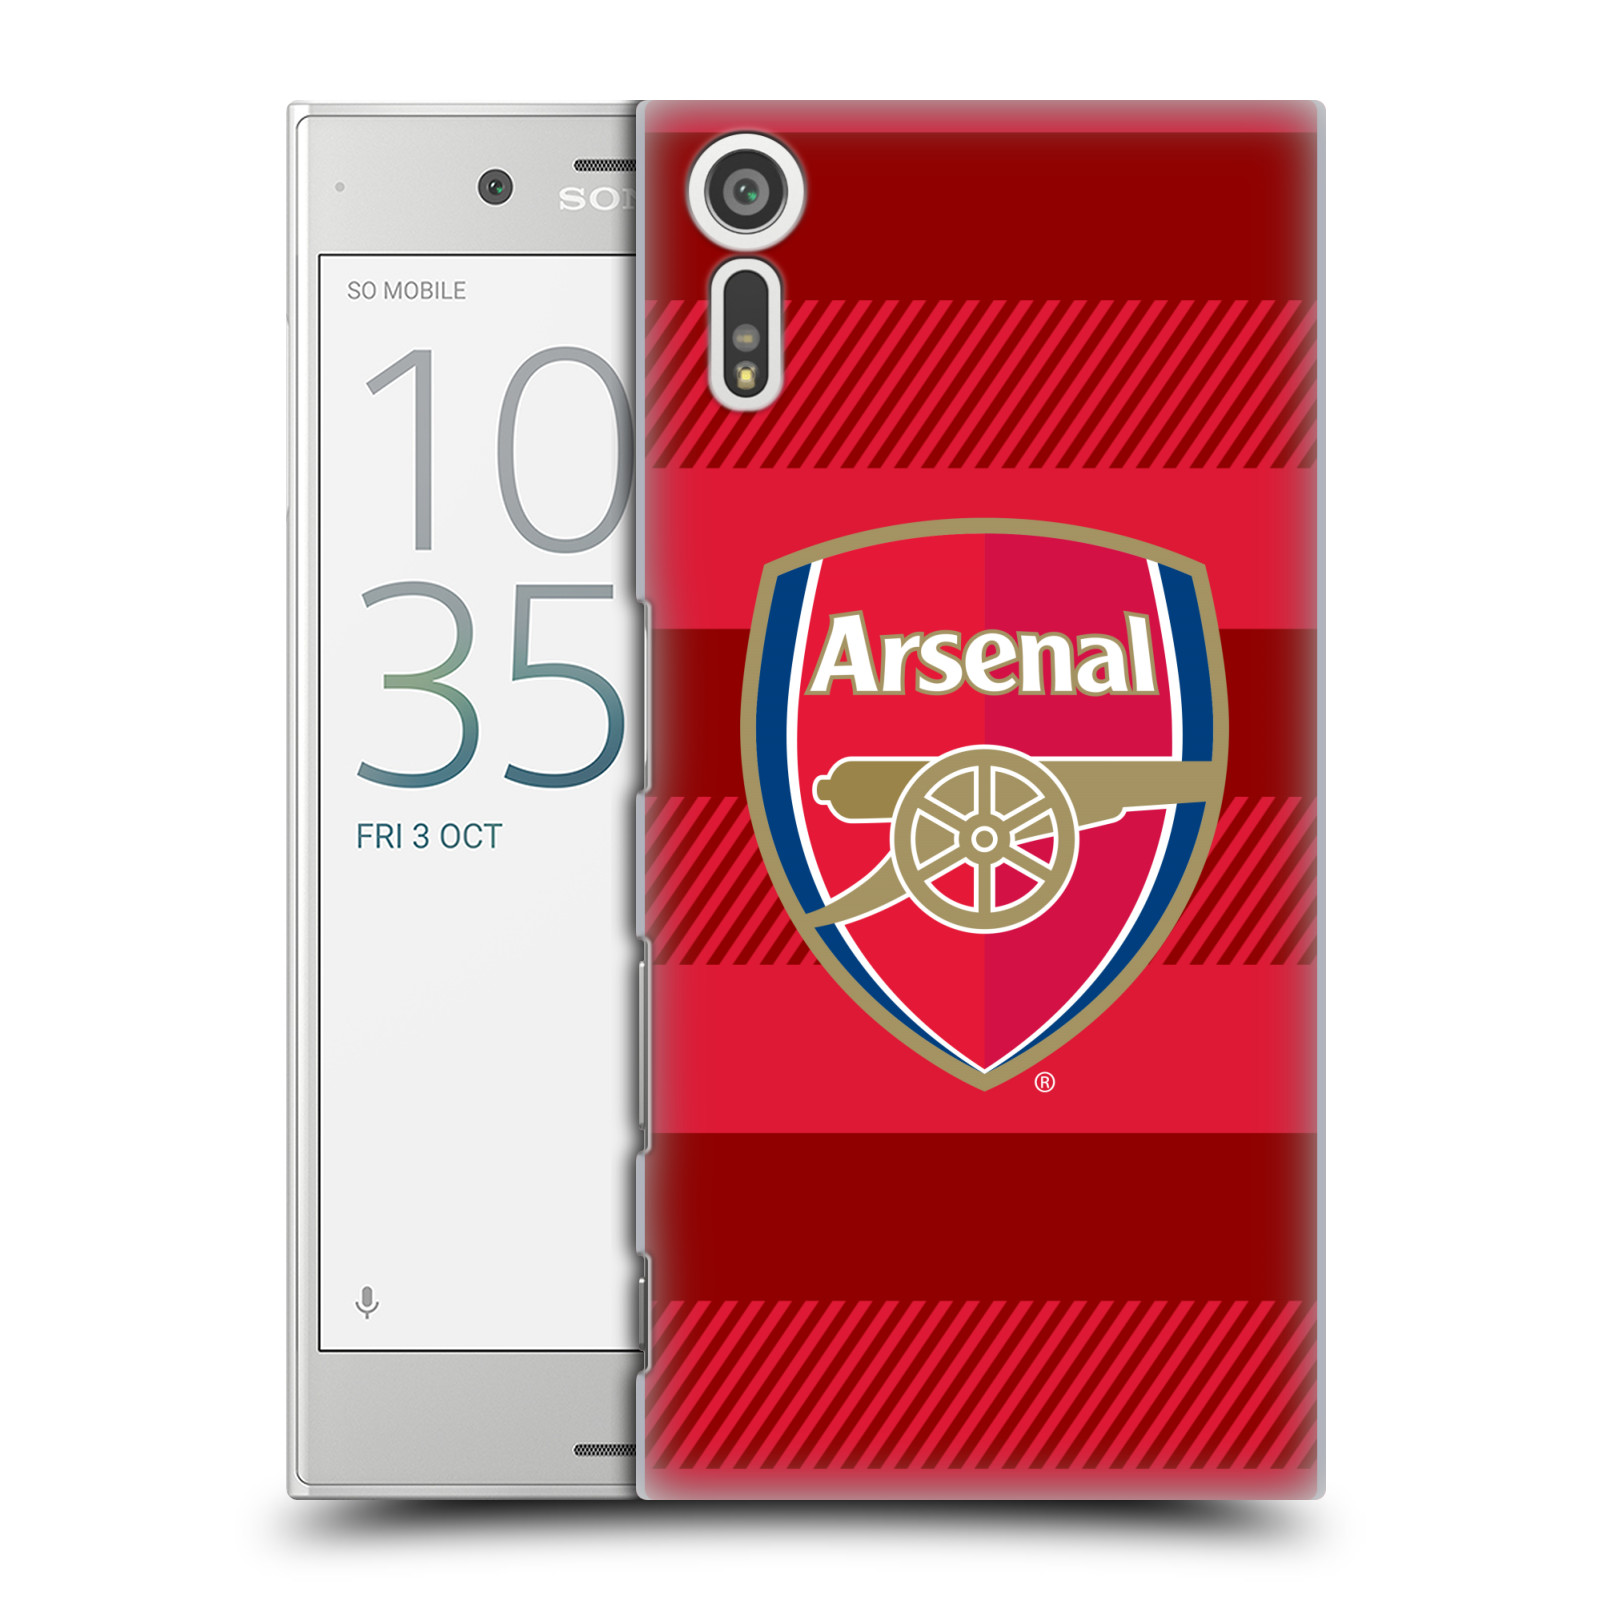 Plastové pouzdro na mobil Sony Xperia XZ - Head Case - Arsenal FC - Logo s pruhy